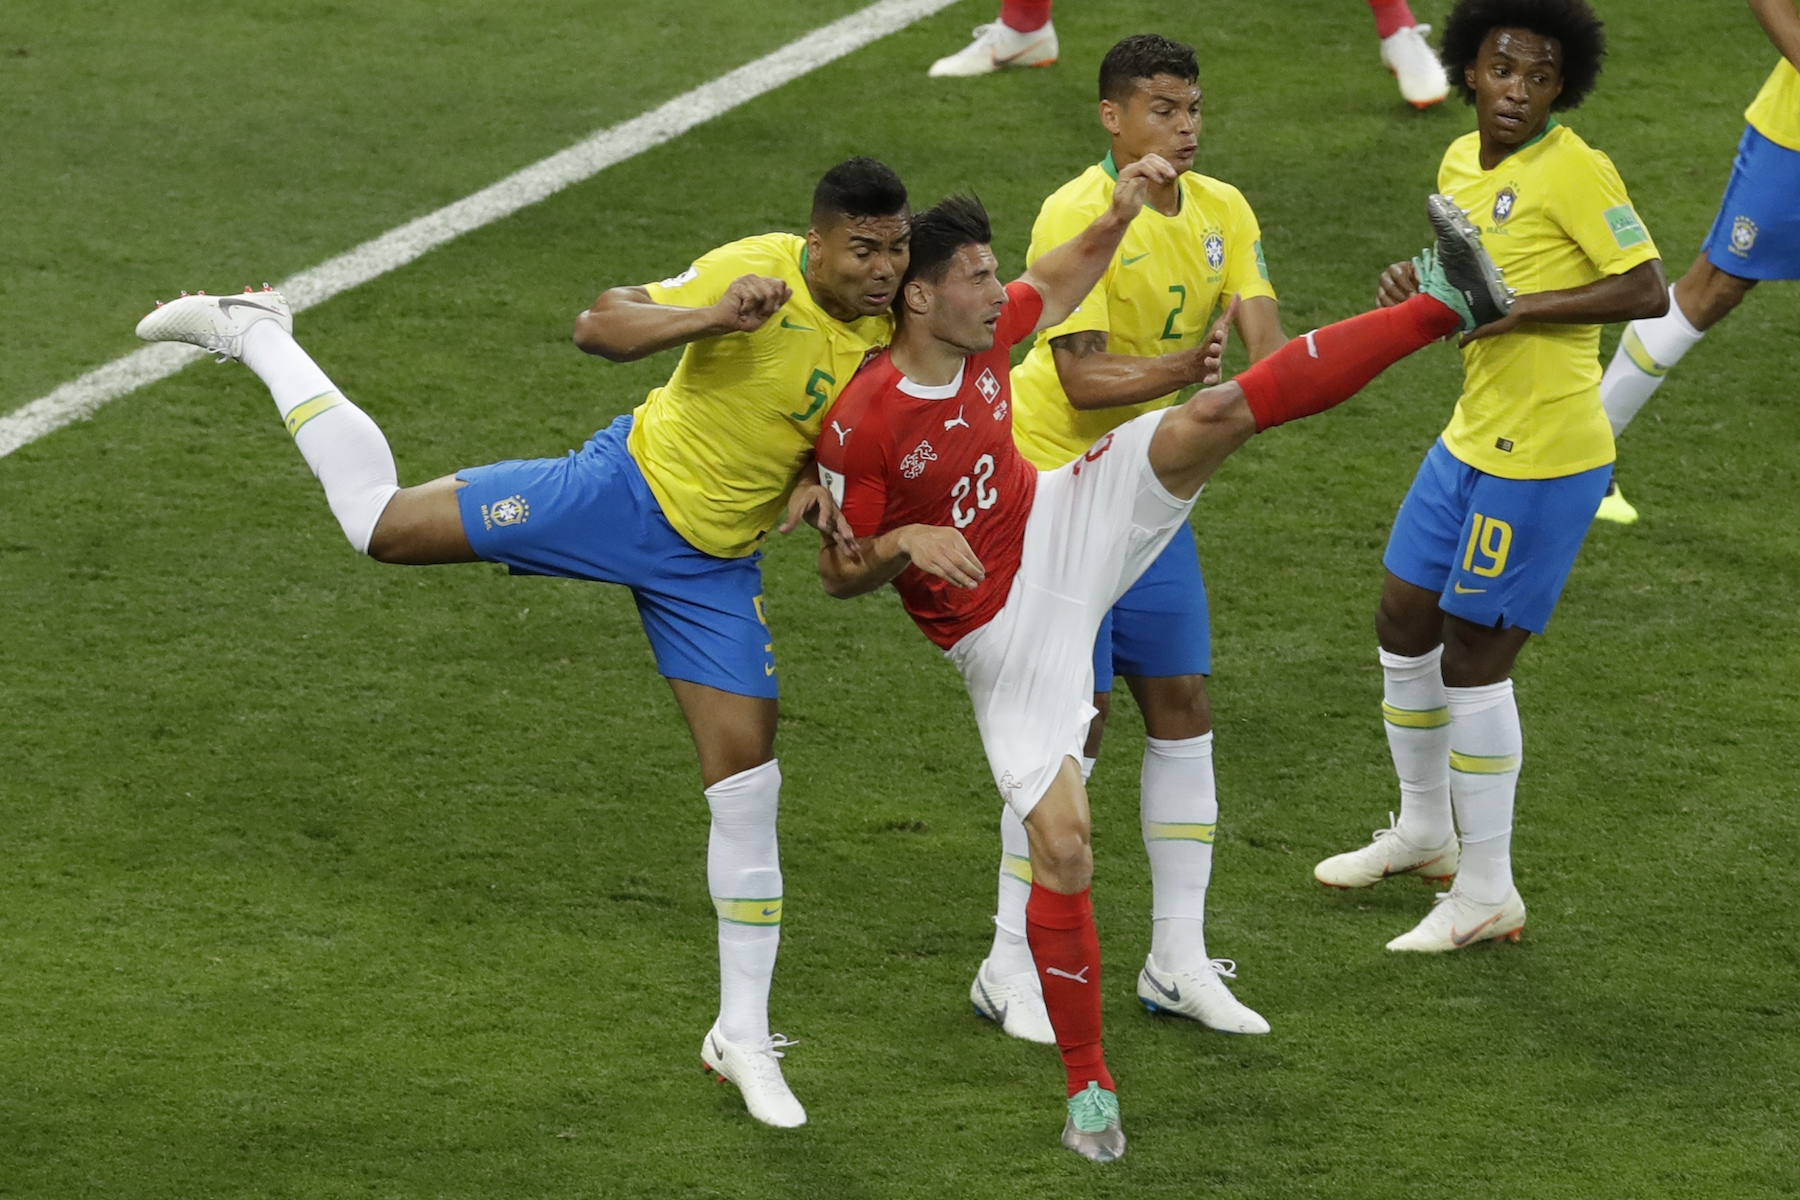 <div class='meta'><div class='origin-logo' data-origin='AP'></div><span class='caption-text' data-credit='AP Photo/Andrew Medichini'>Brazil's Casemiro, left, and Switzerland's Fabian Schaer collide during the group E match between Brazil and Switzerland at the 2018 soccer World Cup.</span></div>